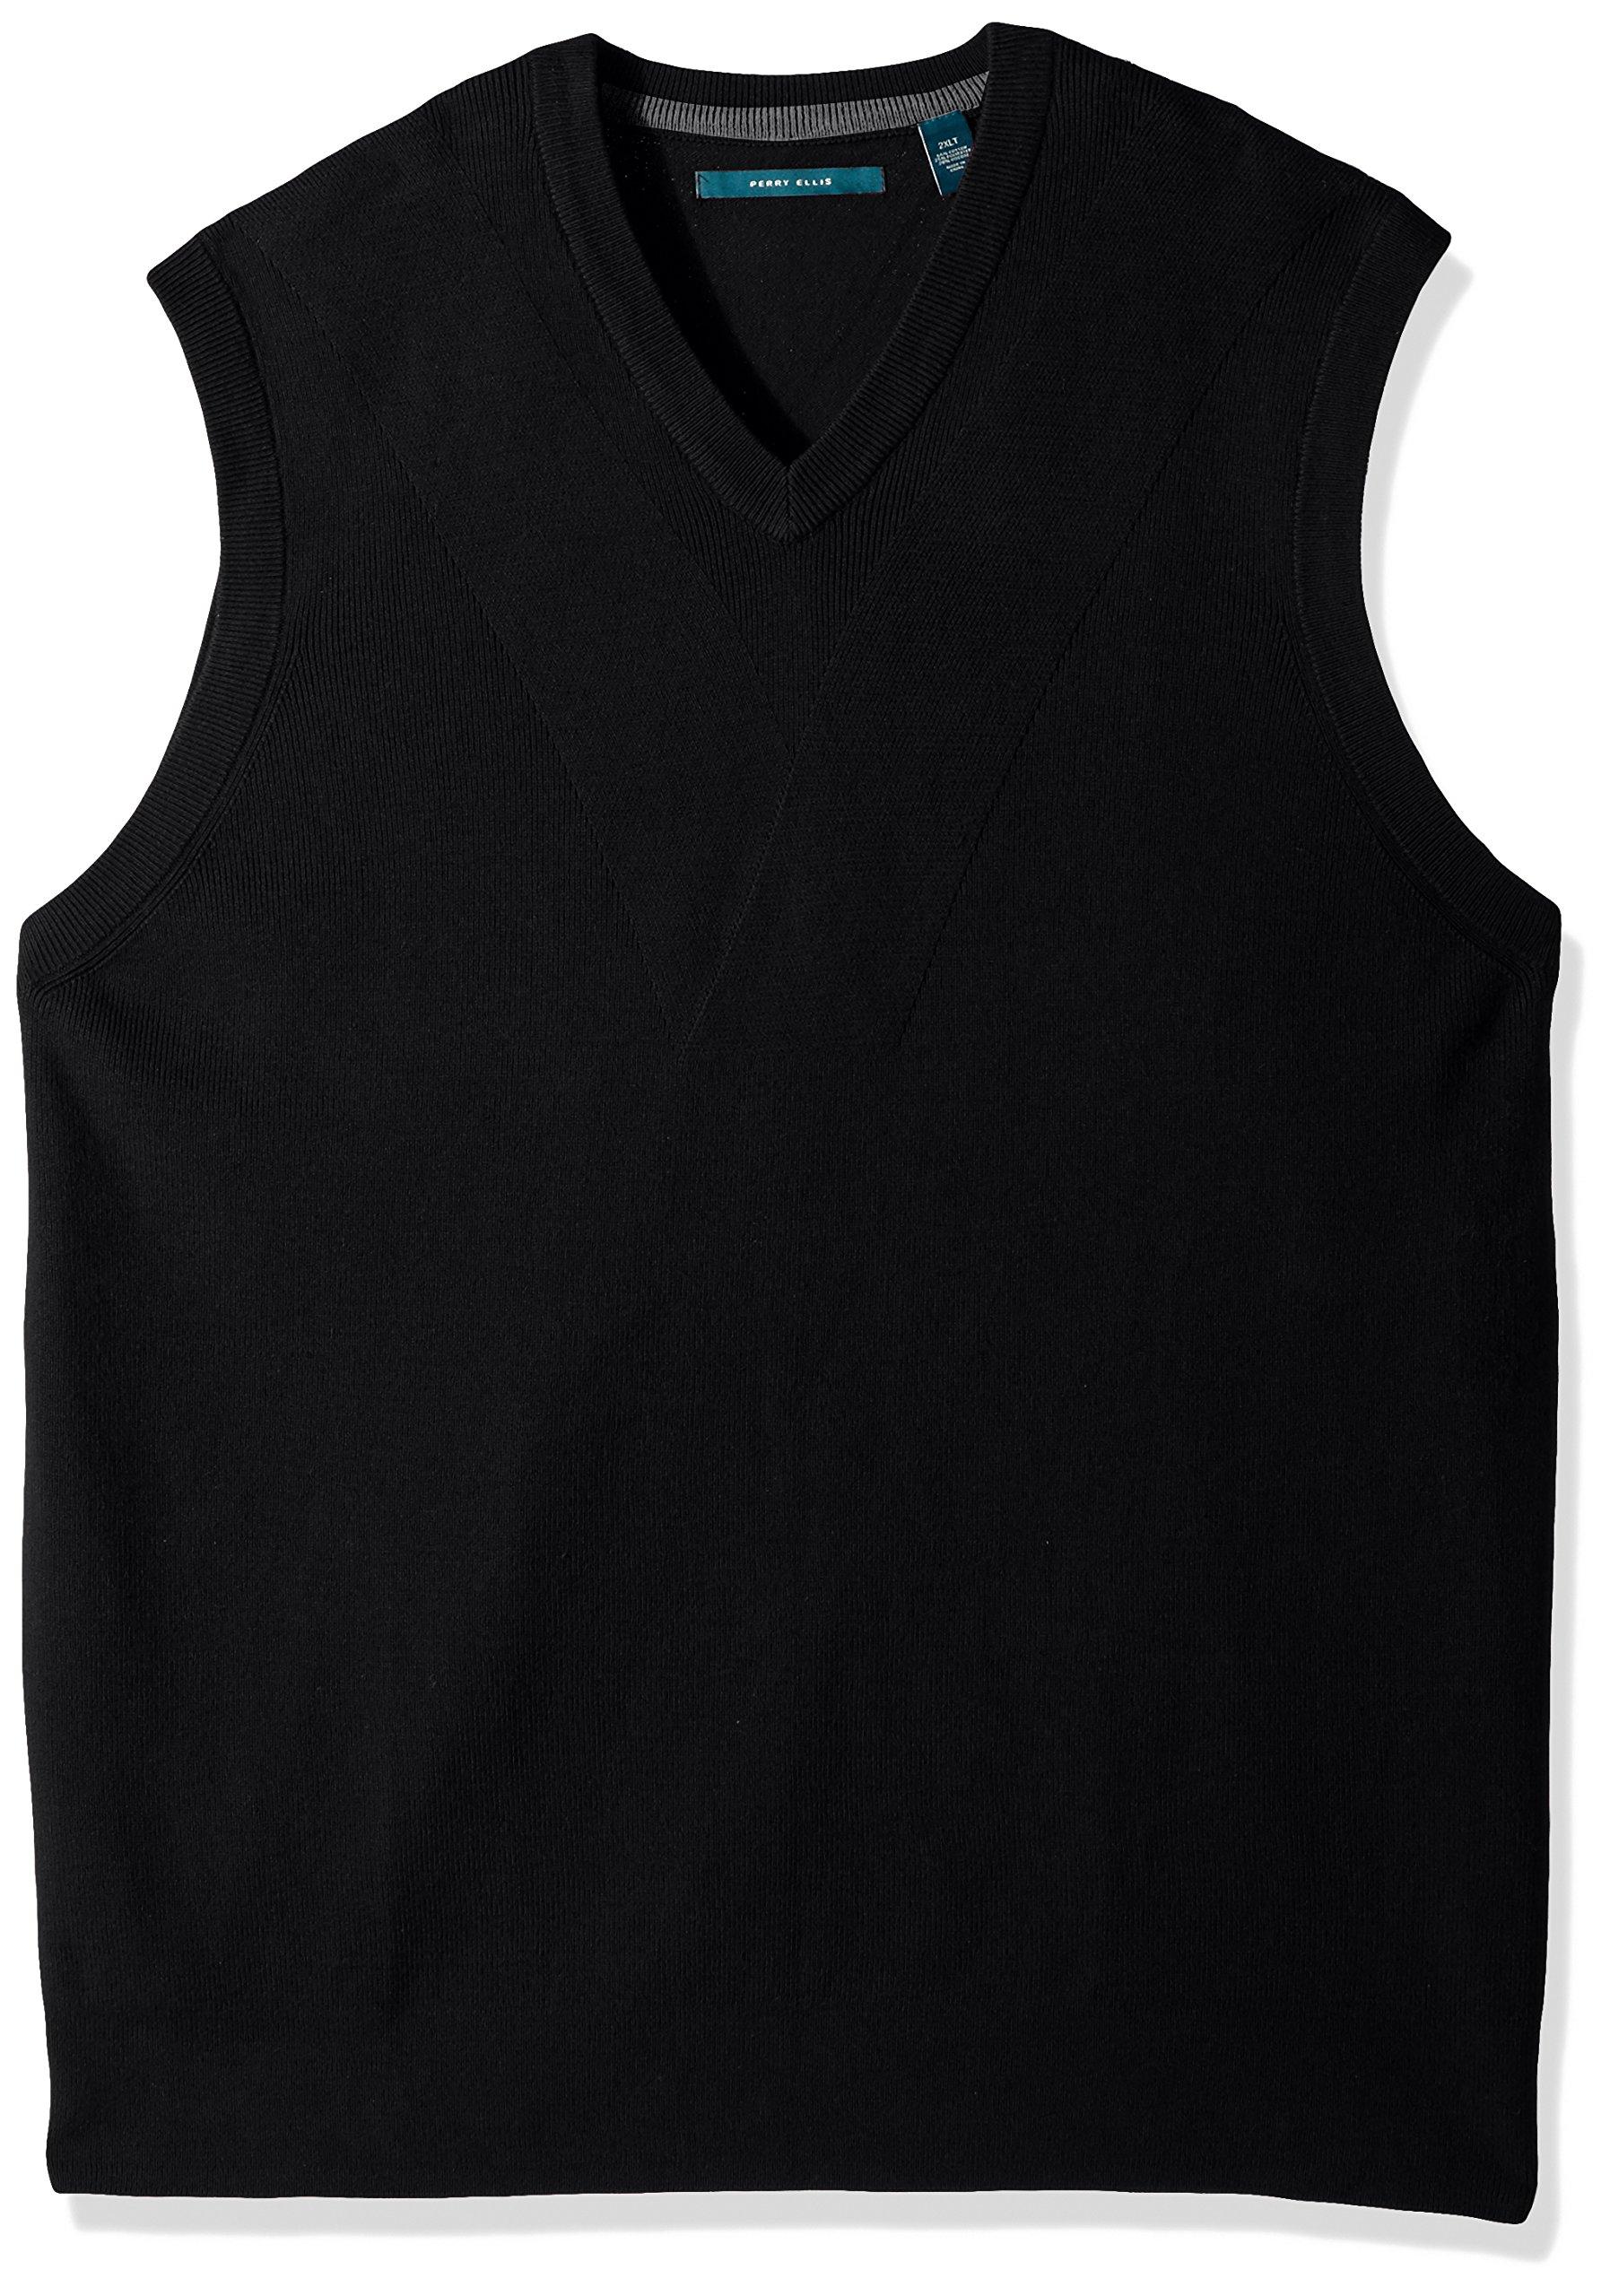 Perry Ellis Men's Pullover V-Neck Sweater Vest, Black Heather, Small